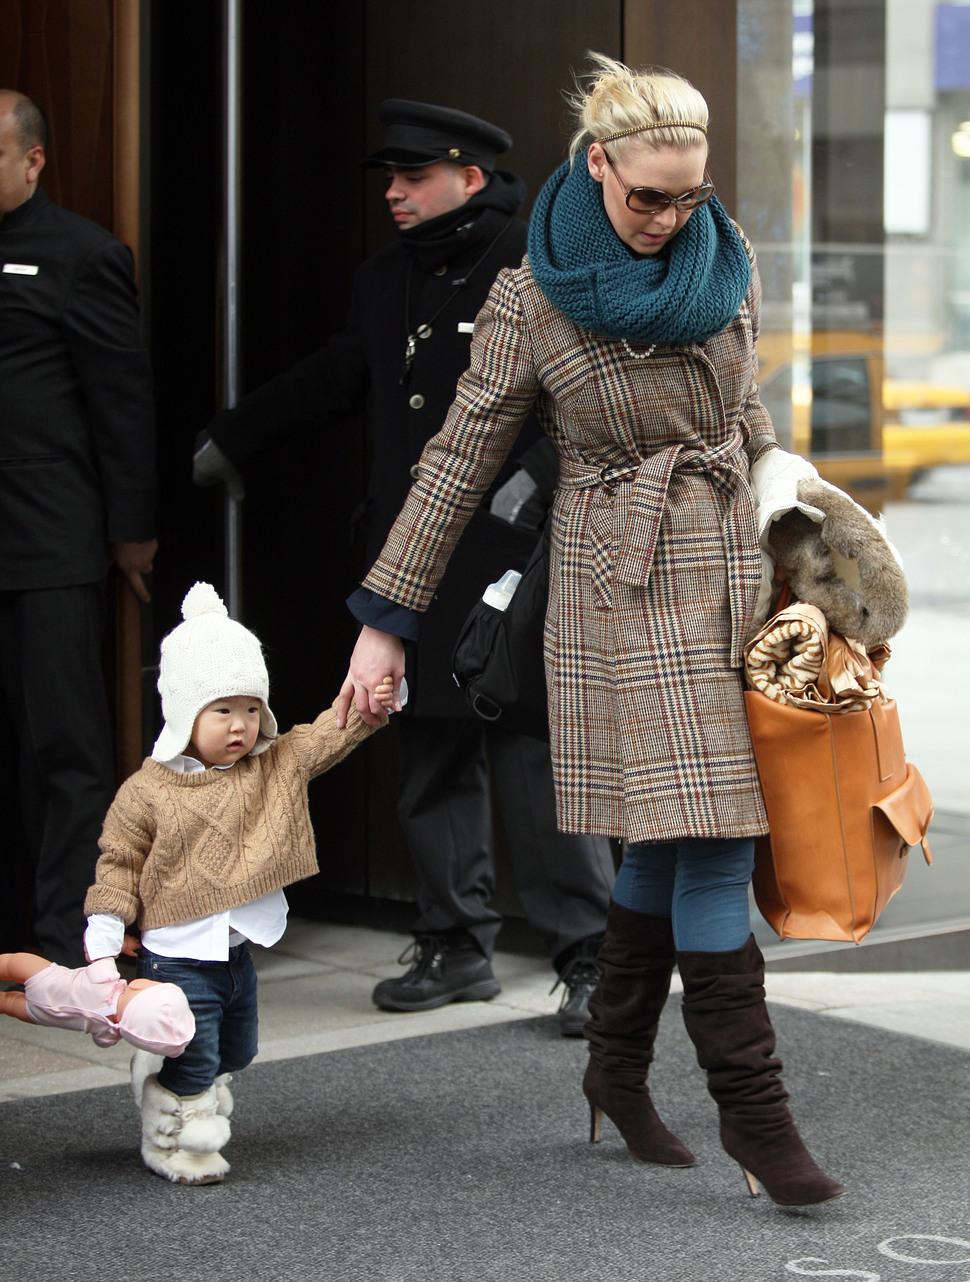 Кэтрин Хайгл: «Моя дочь любит ходить на каблуках»